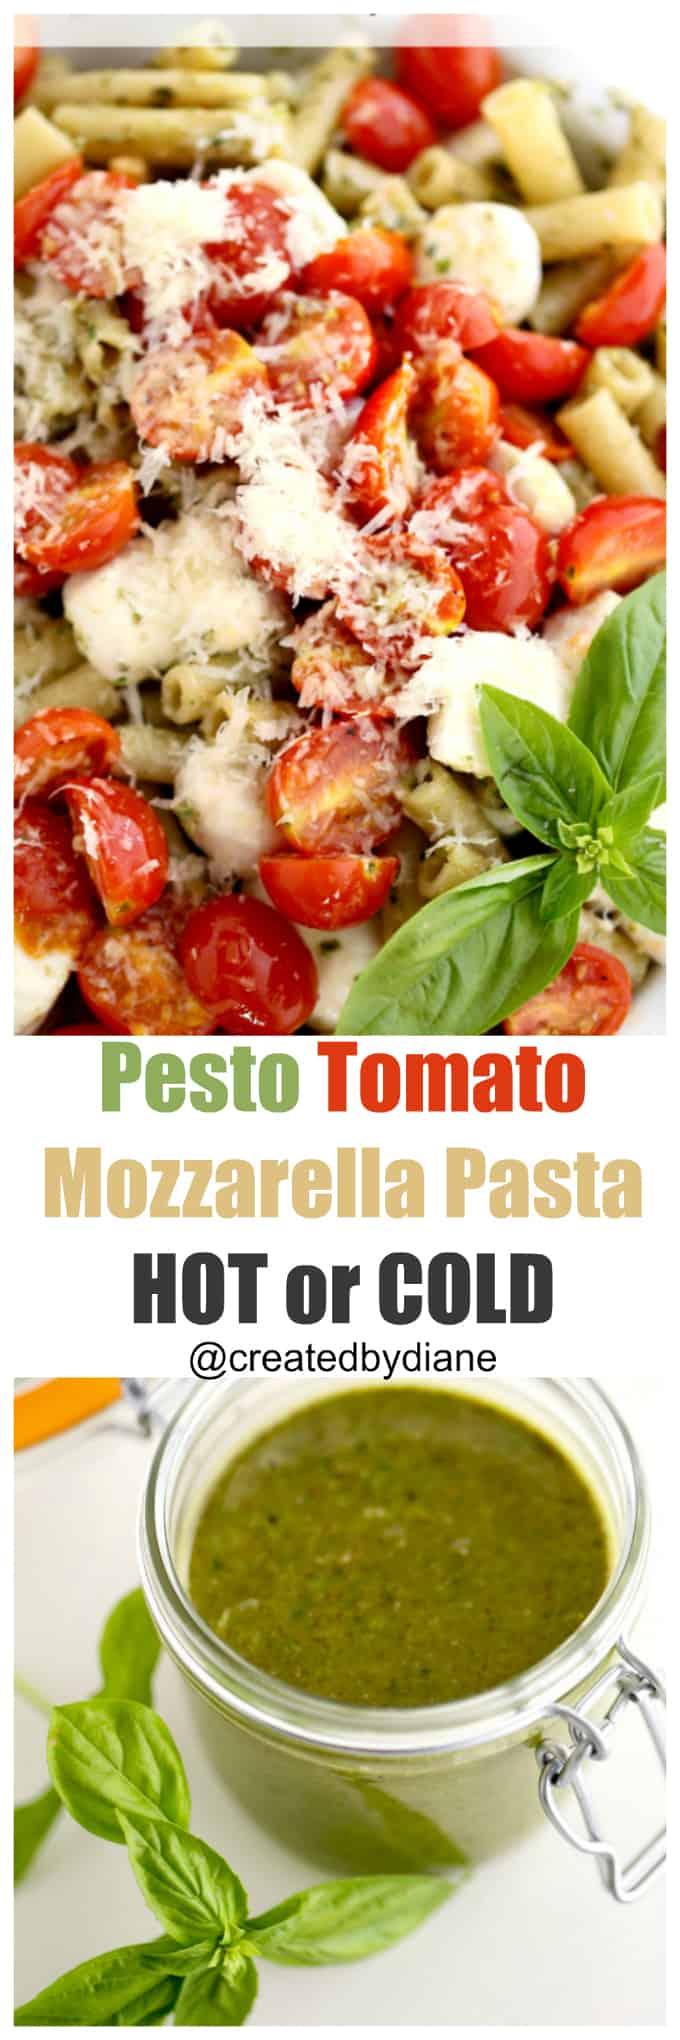 Pesto Tomato Mozzarella Pasta Hot or cold pasta salad @createdbydiane